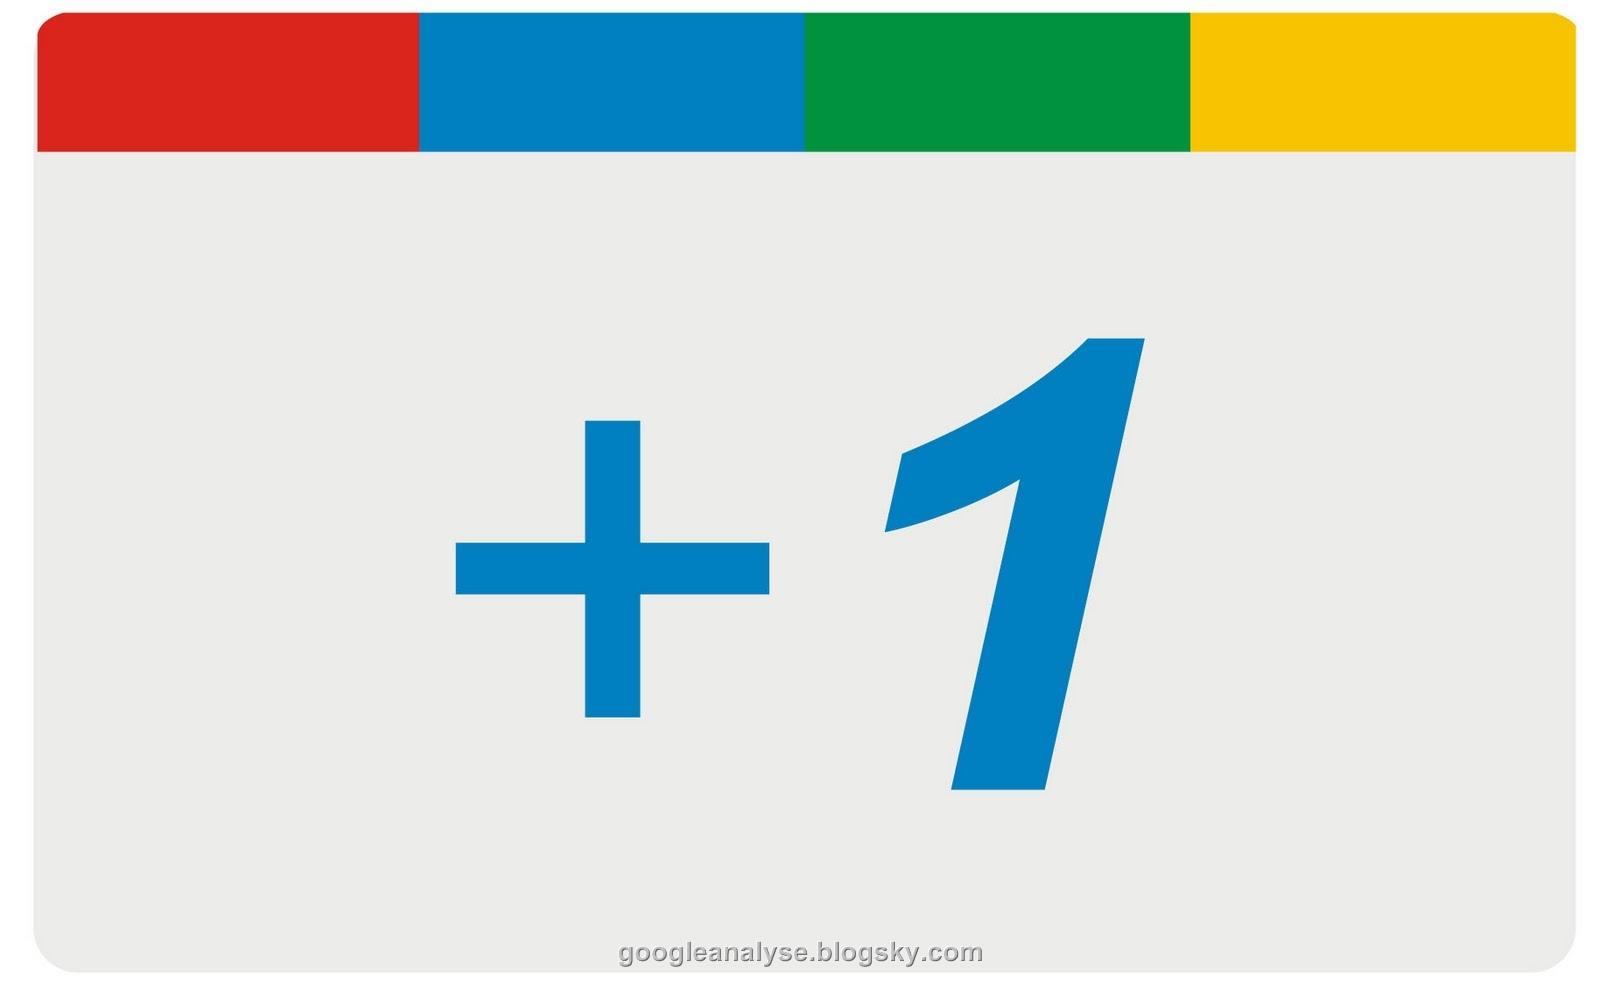 google + 1